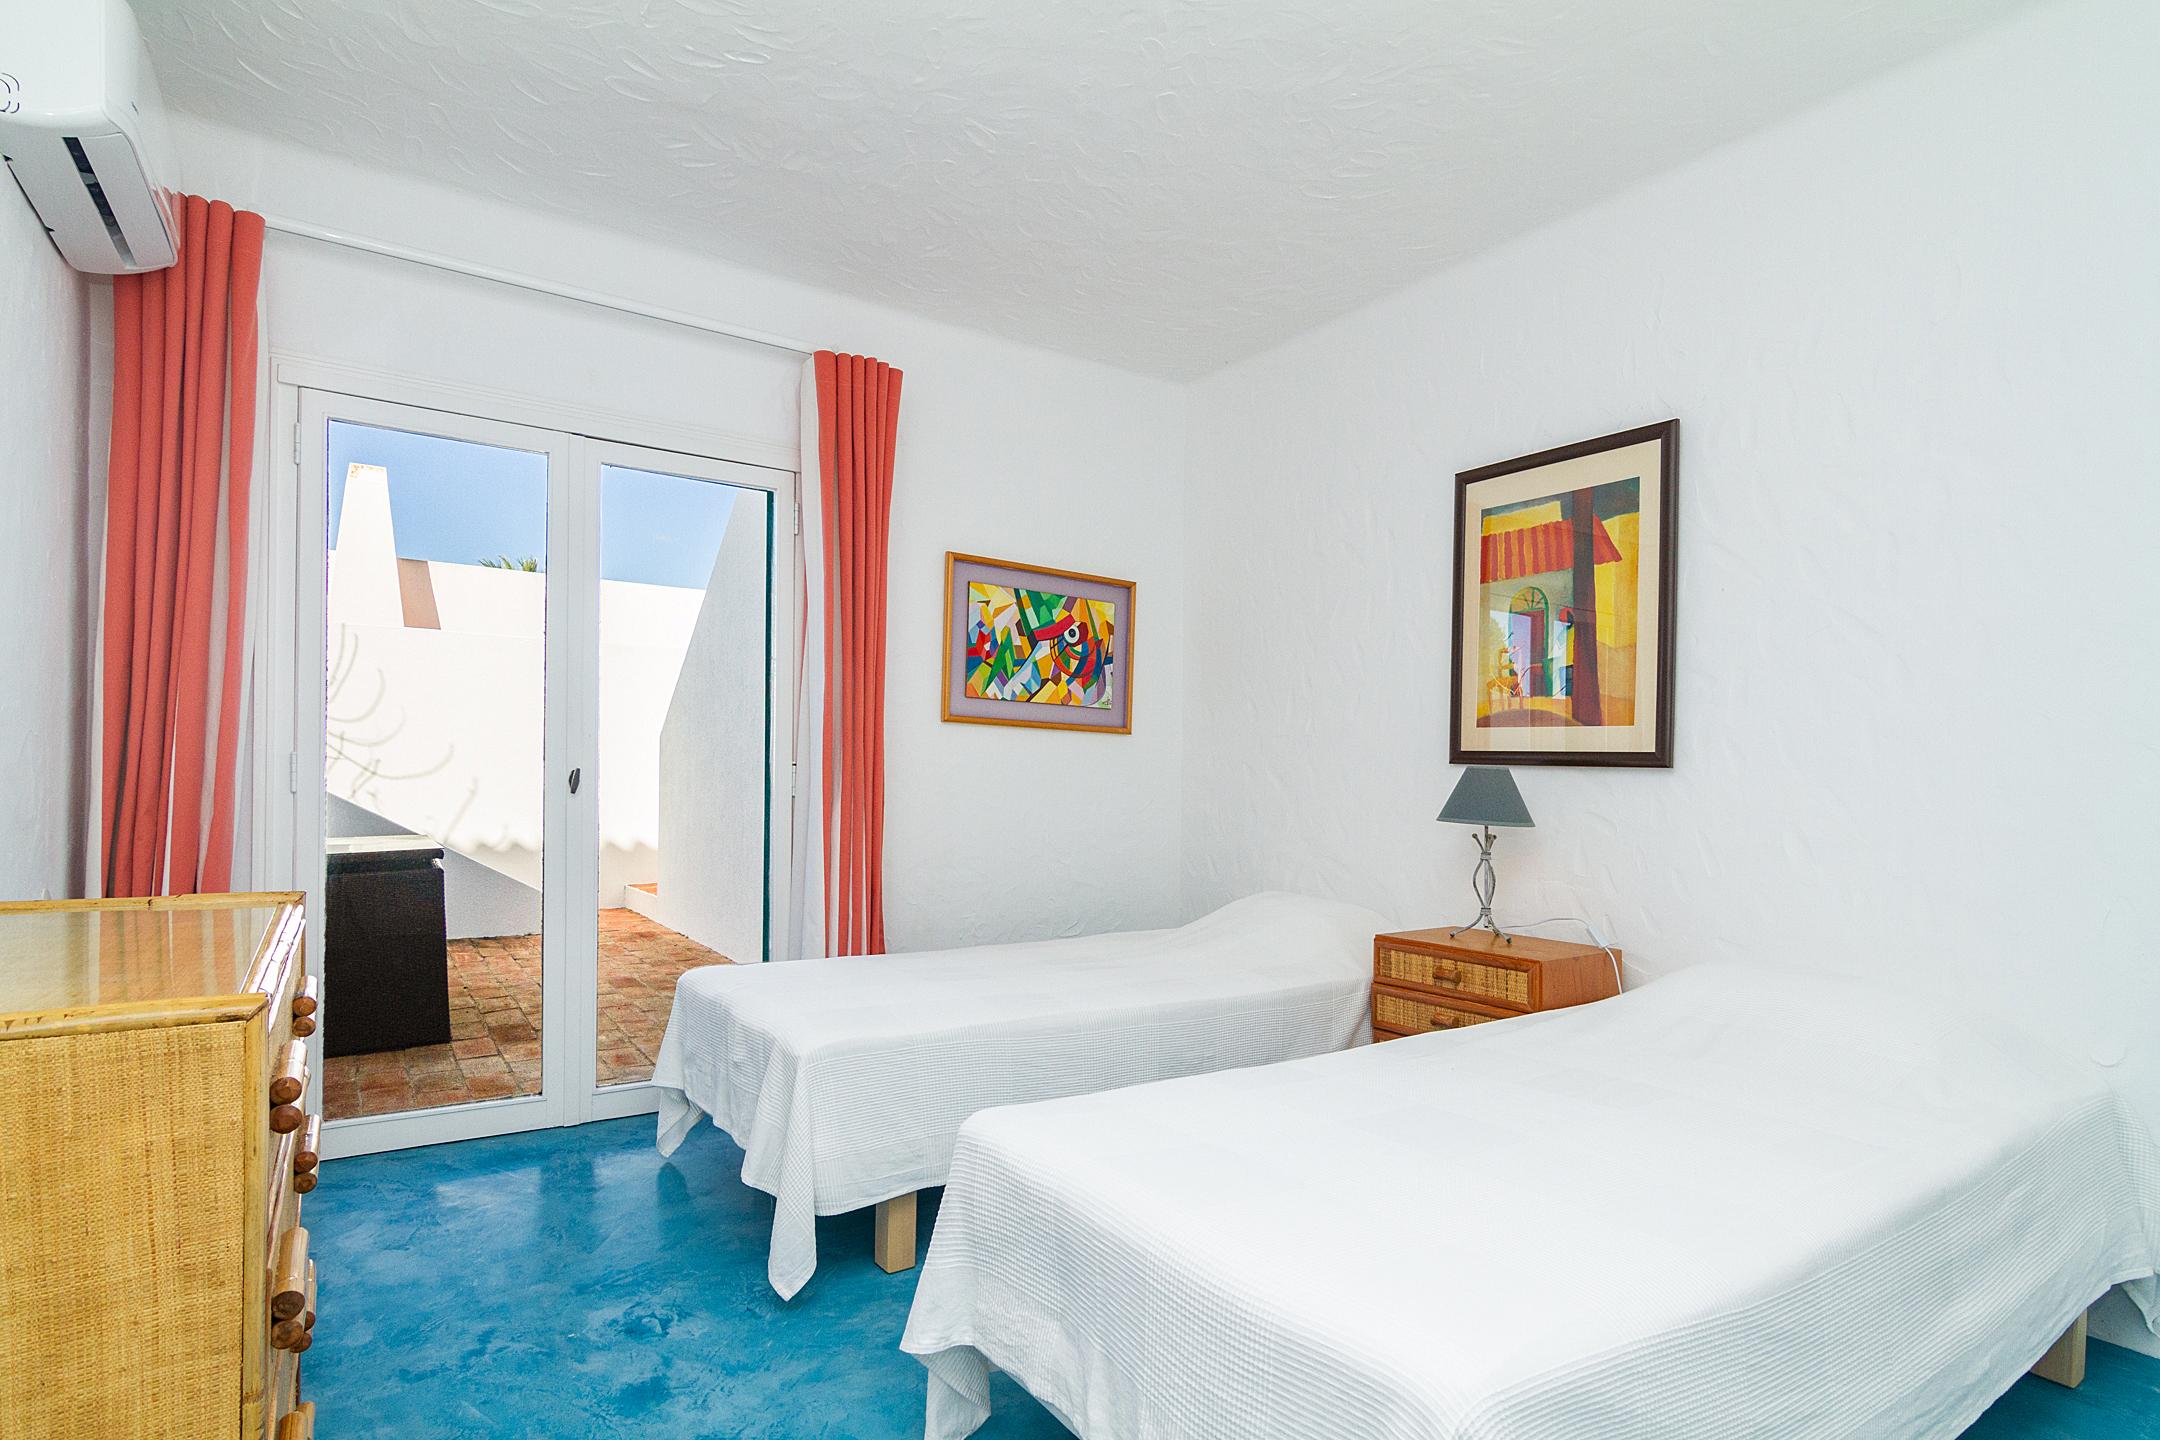 Location appartements et villas de vacance, Liiiving in Algarve | Alvor Blue Villa à Alvor, Portugal Algarve, REF_IMG_14545_14555